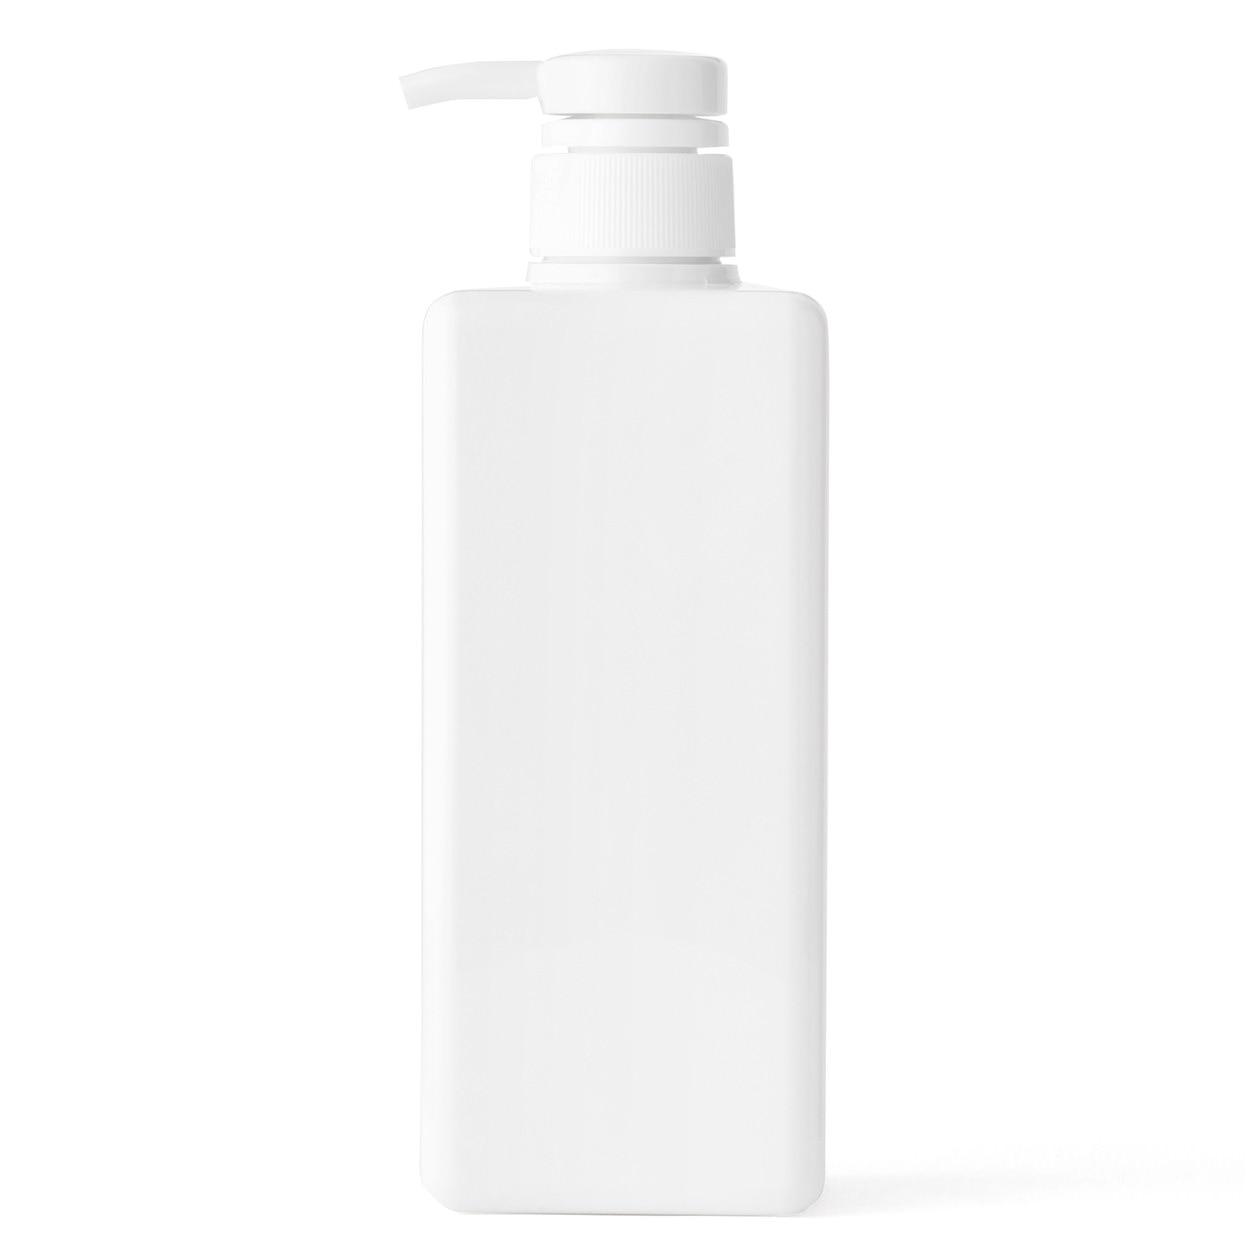 PET詰替ボトル ホワイト 600ml用 ホワイト 600ml用の写真